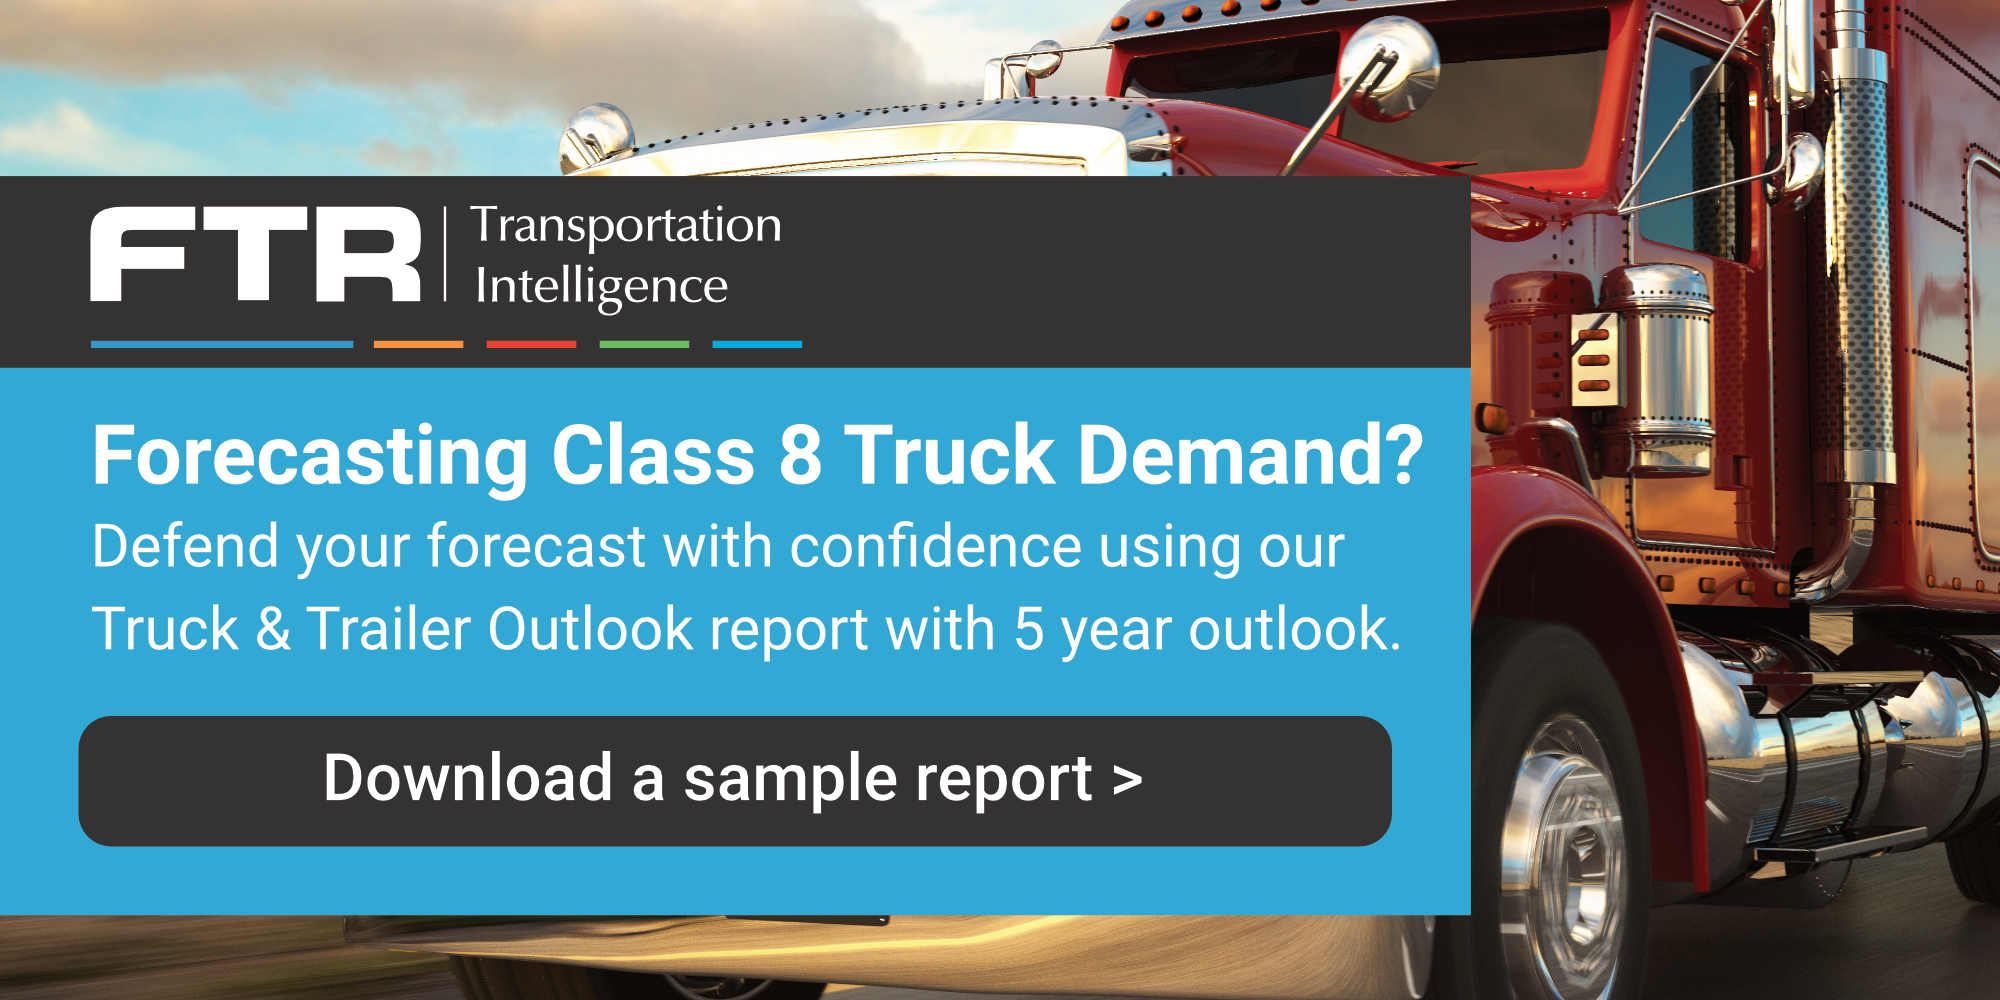 Forecasting Class 8 Truck Demand